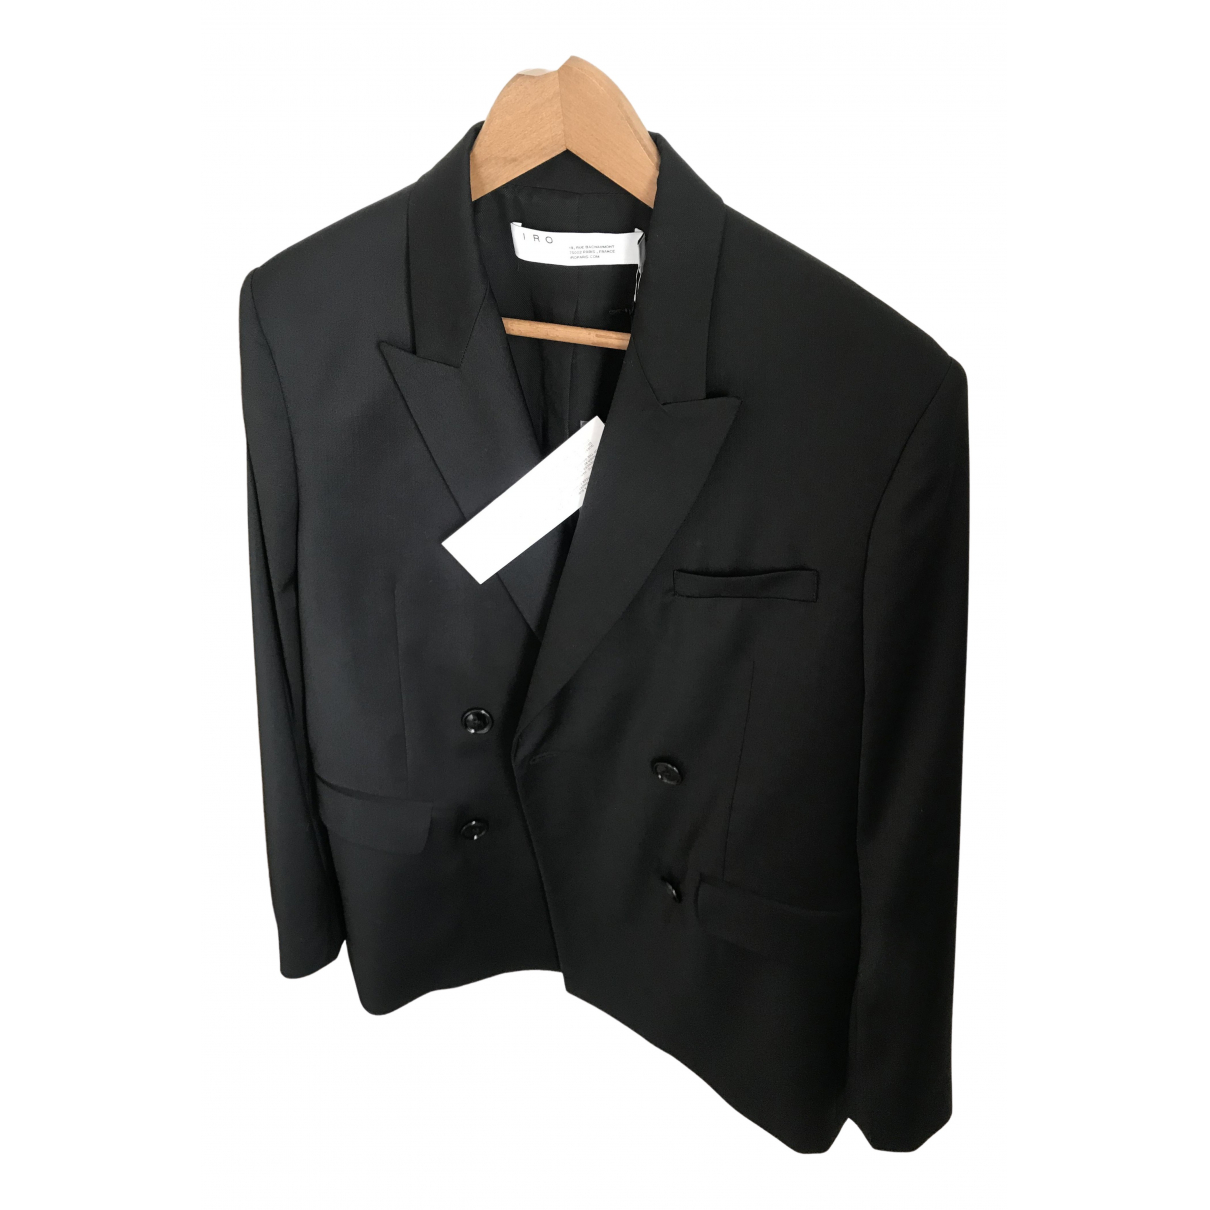 Iro - Veste Spring Summer 2020 pour femme en laine - noir